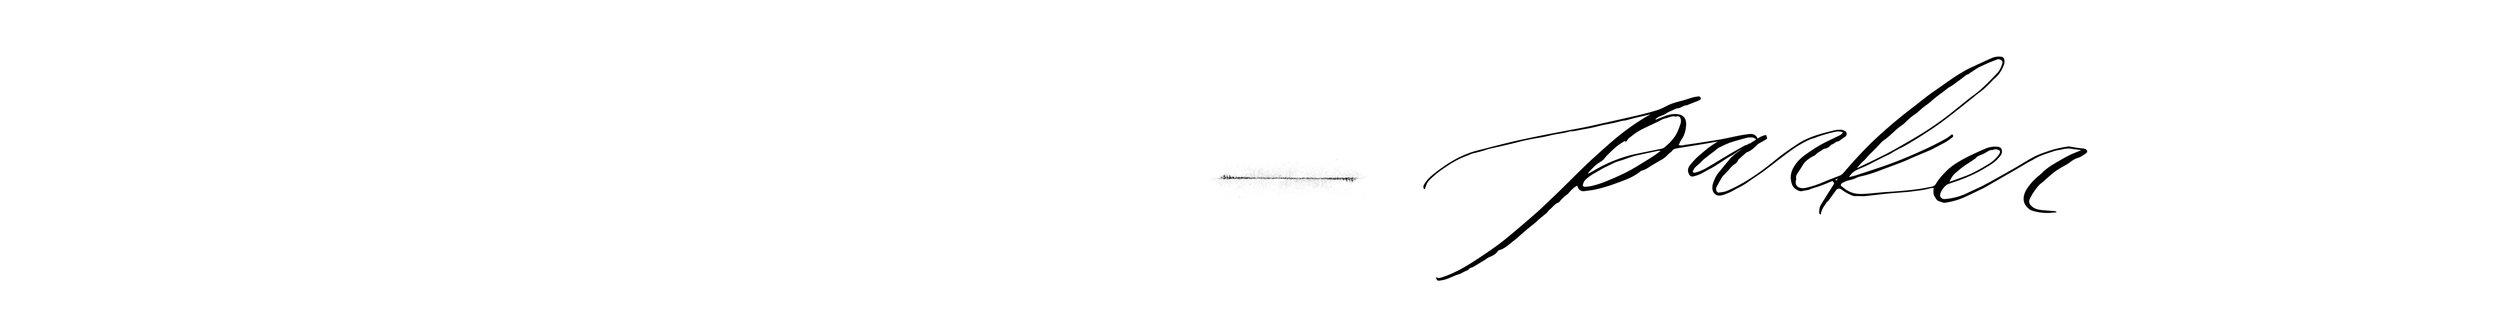 First-Name-Transparent-Background blog signature DASH.jpg